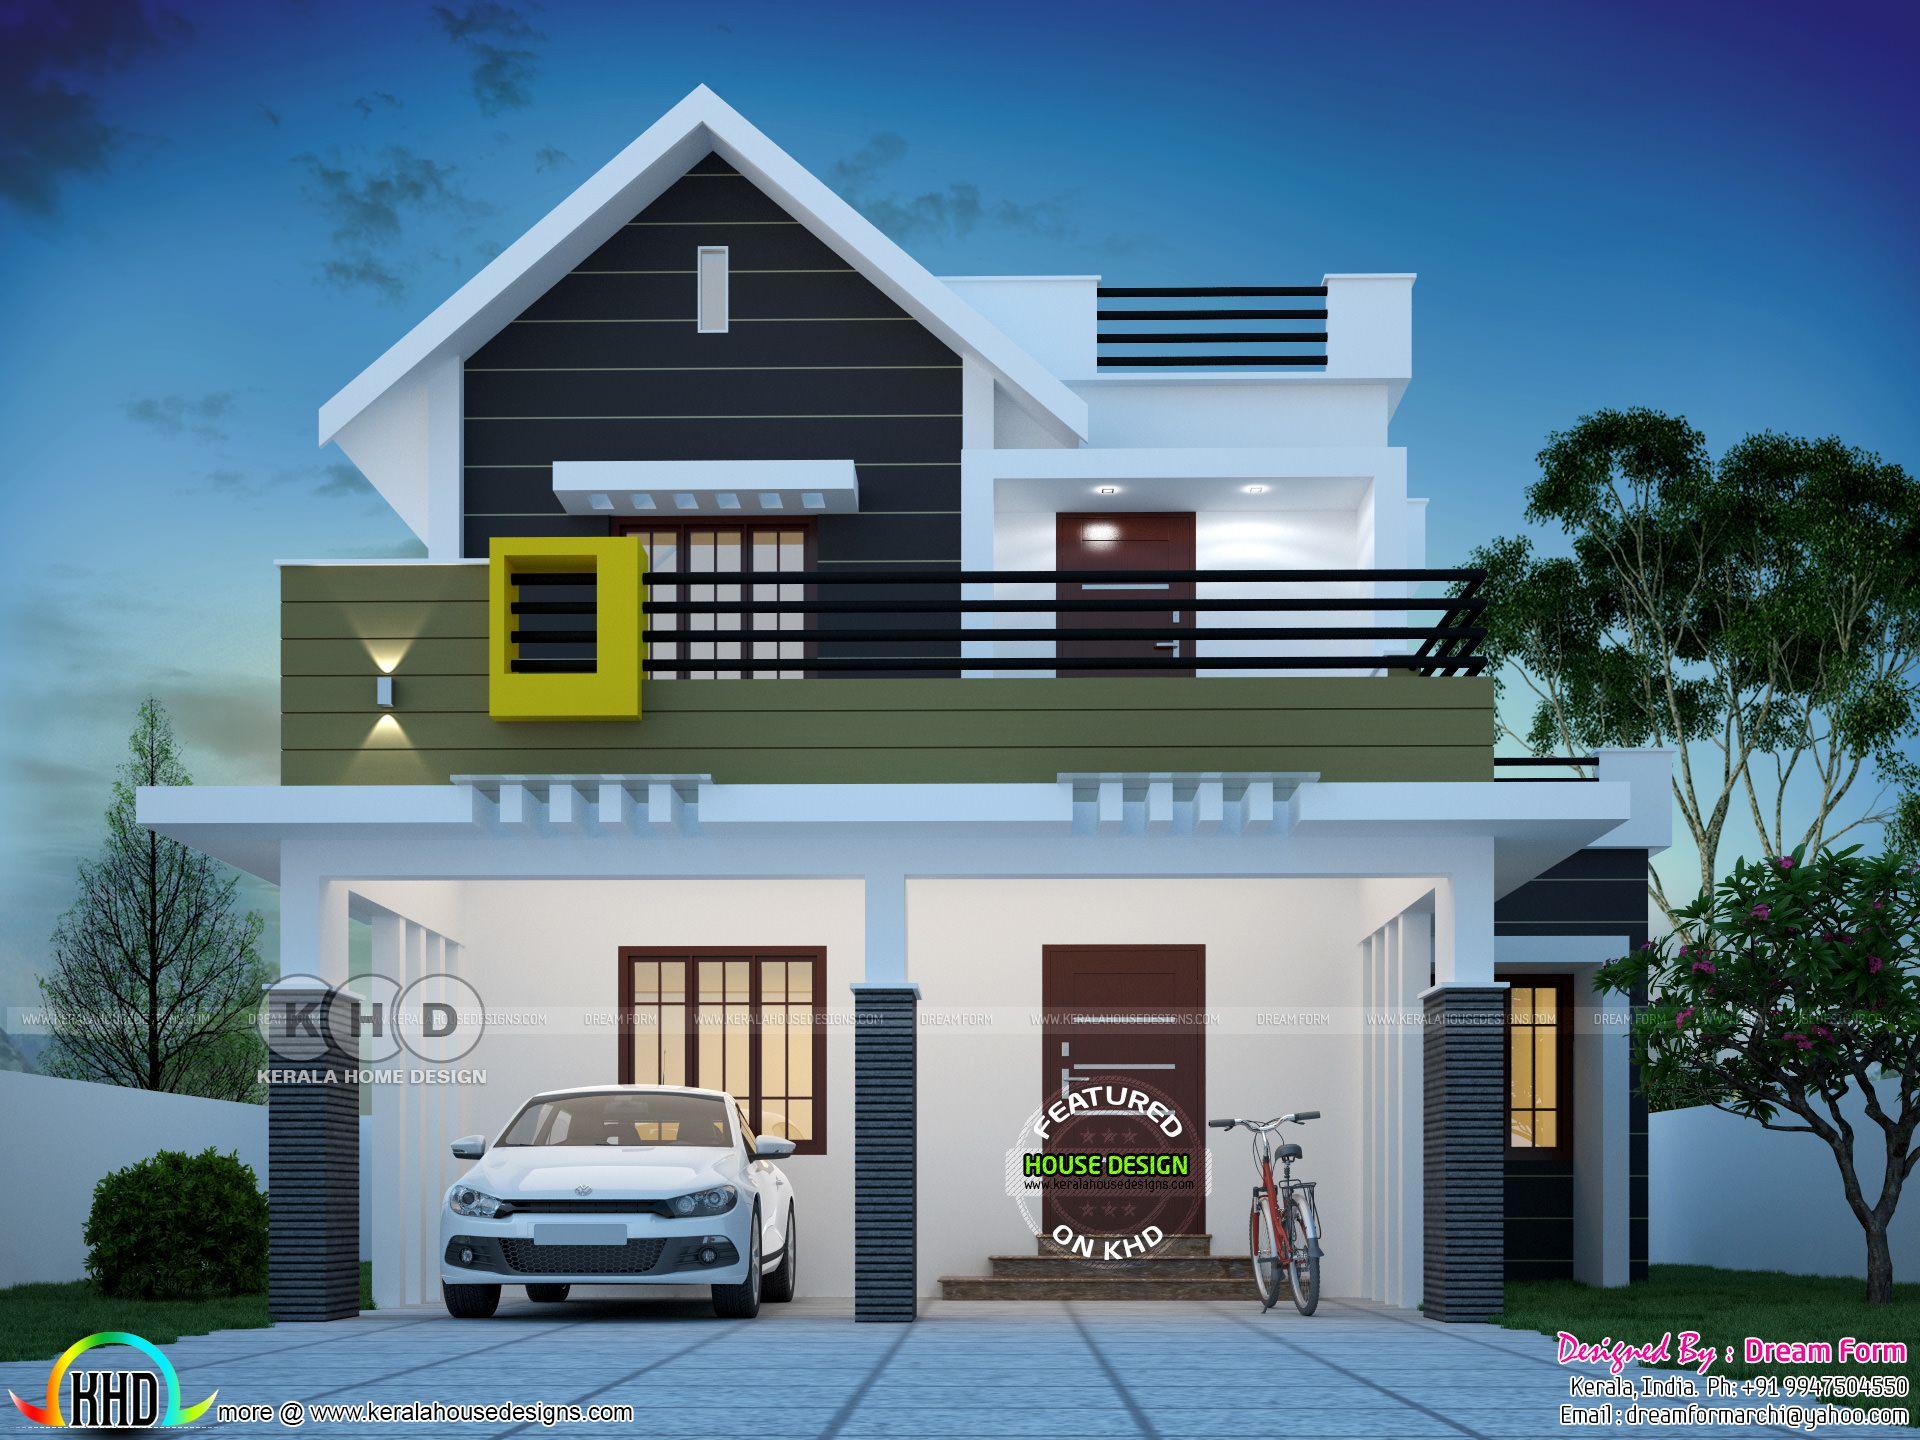 Favrarat Kerala House Design Bungalow House Design Duplex House Design